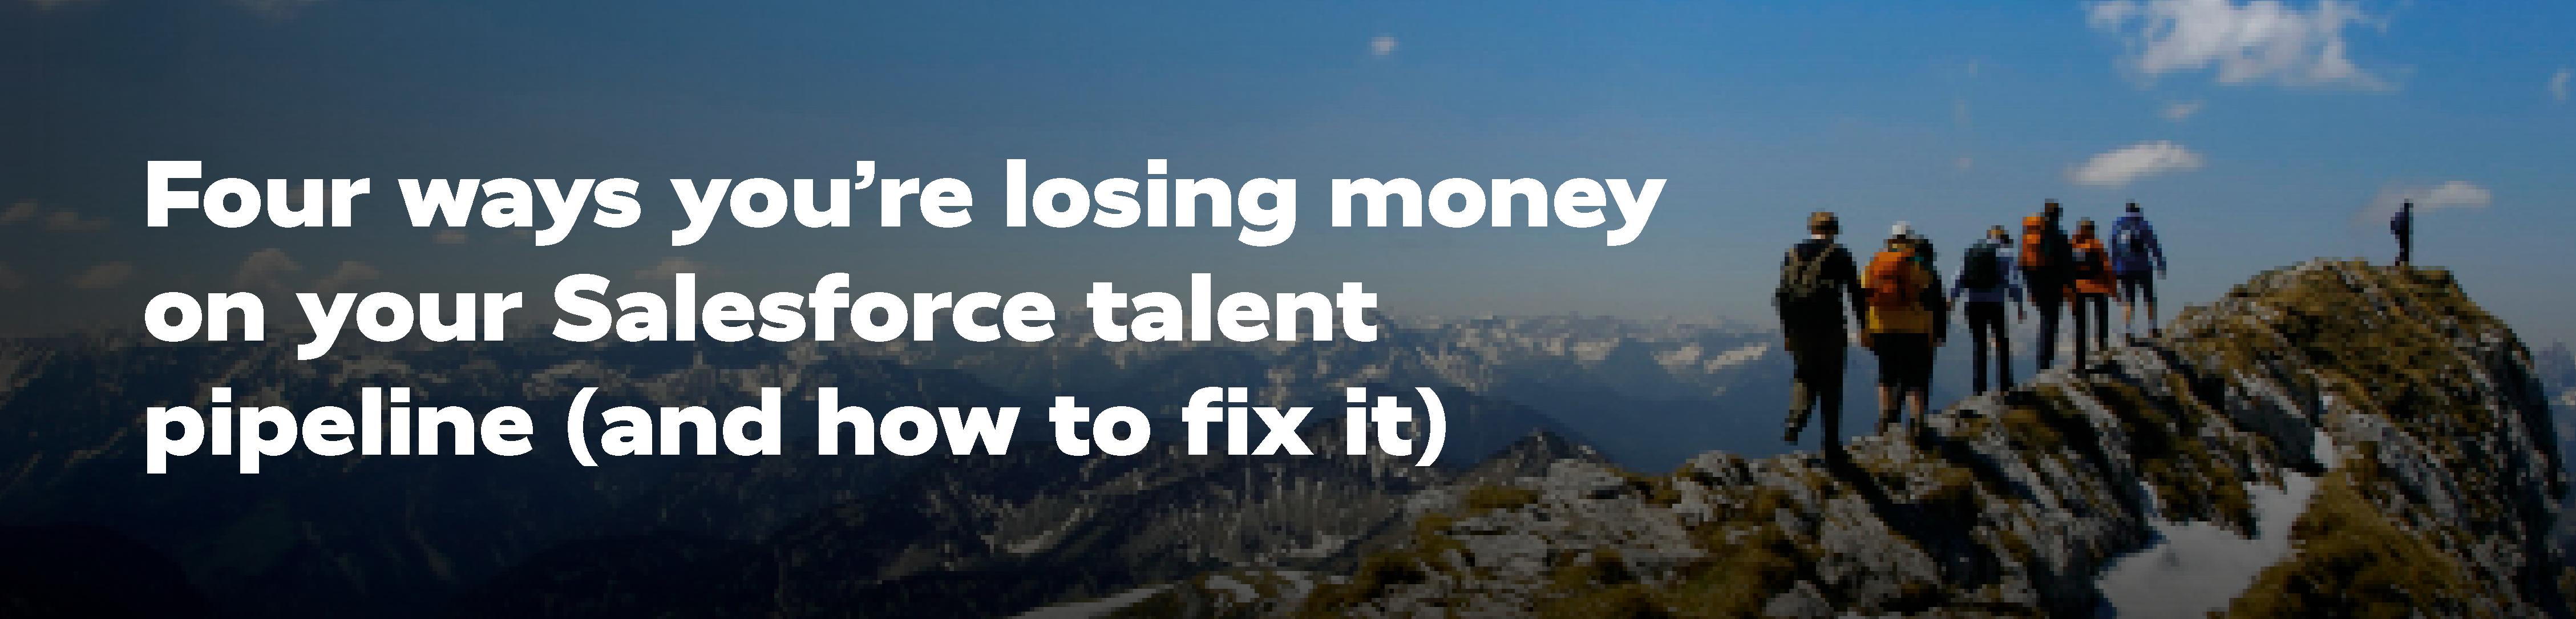 Four ways you're losing money-Blog Header